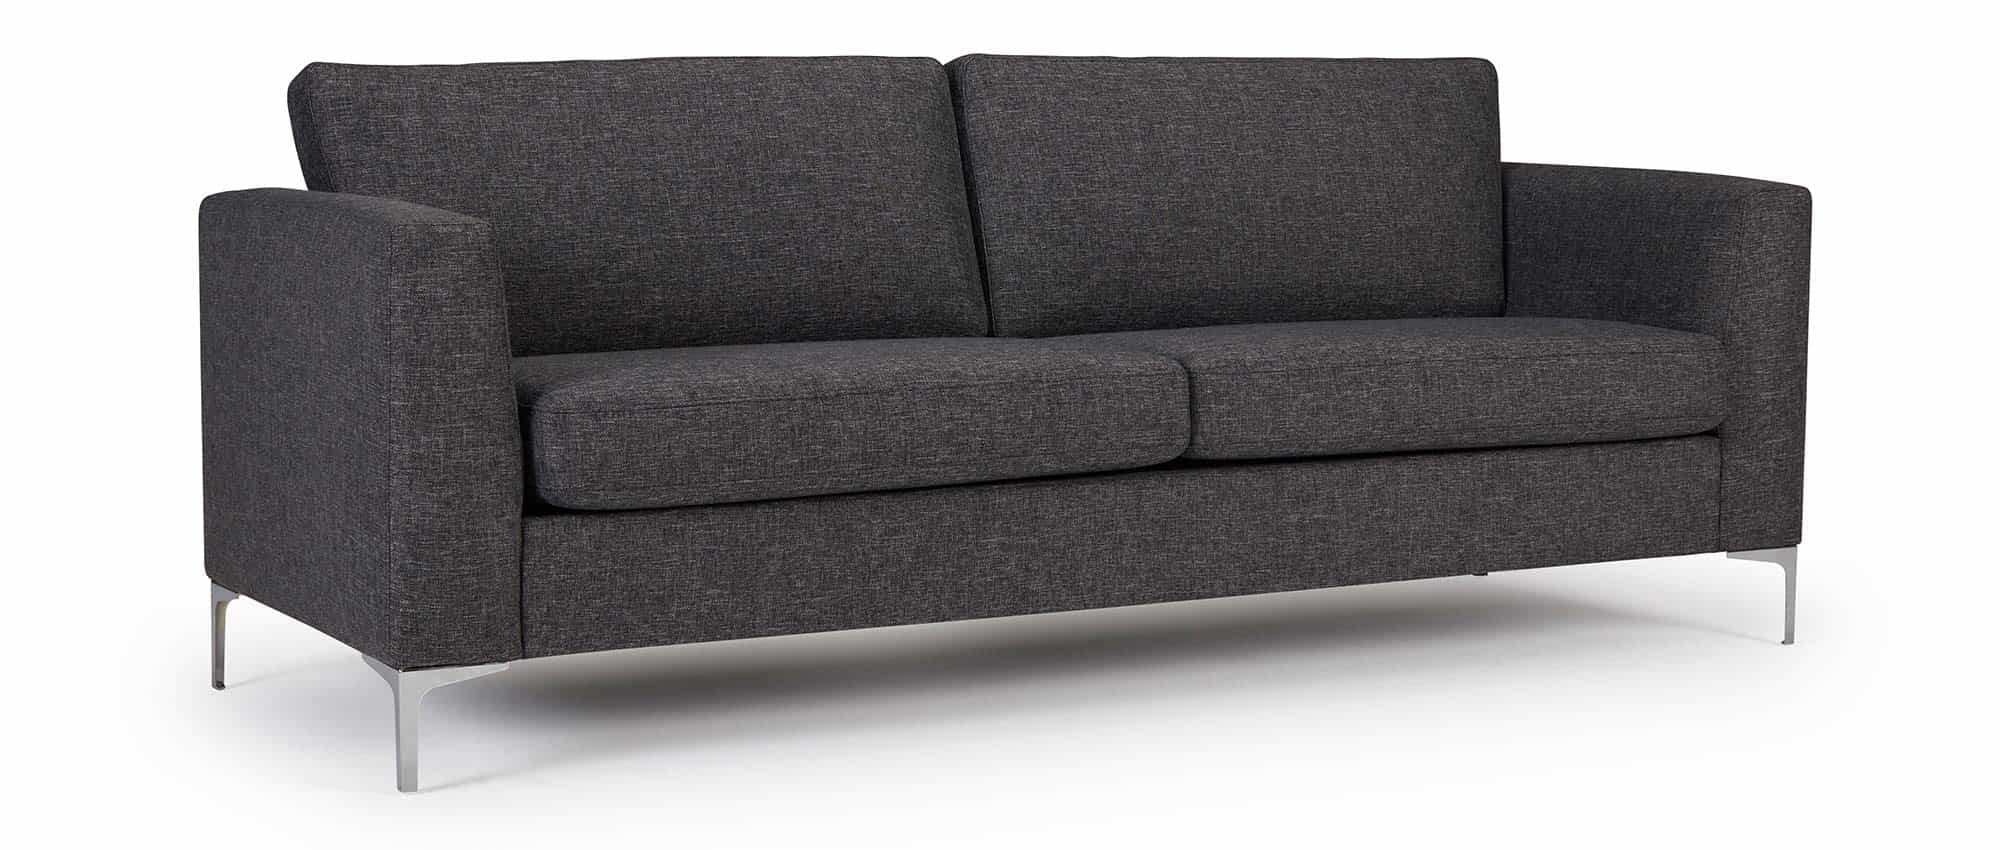 designer sofa trelleborg als 3 sitzer mit polsterarmlehnen. Black Bedroom Furniture Sets. Home Design Ideas